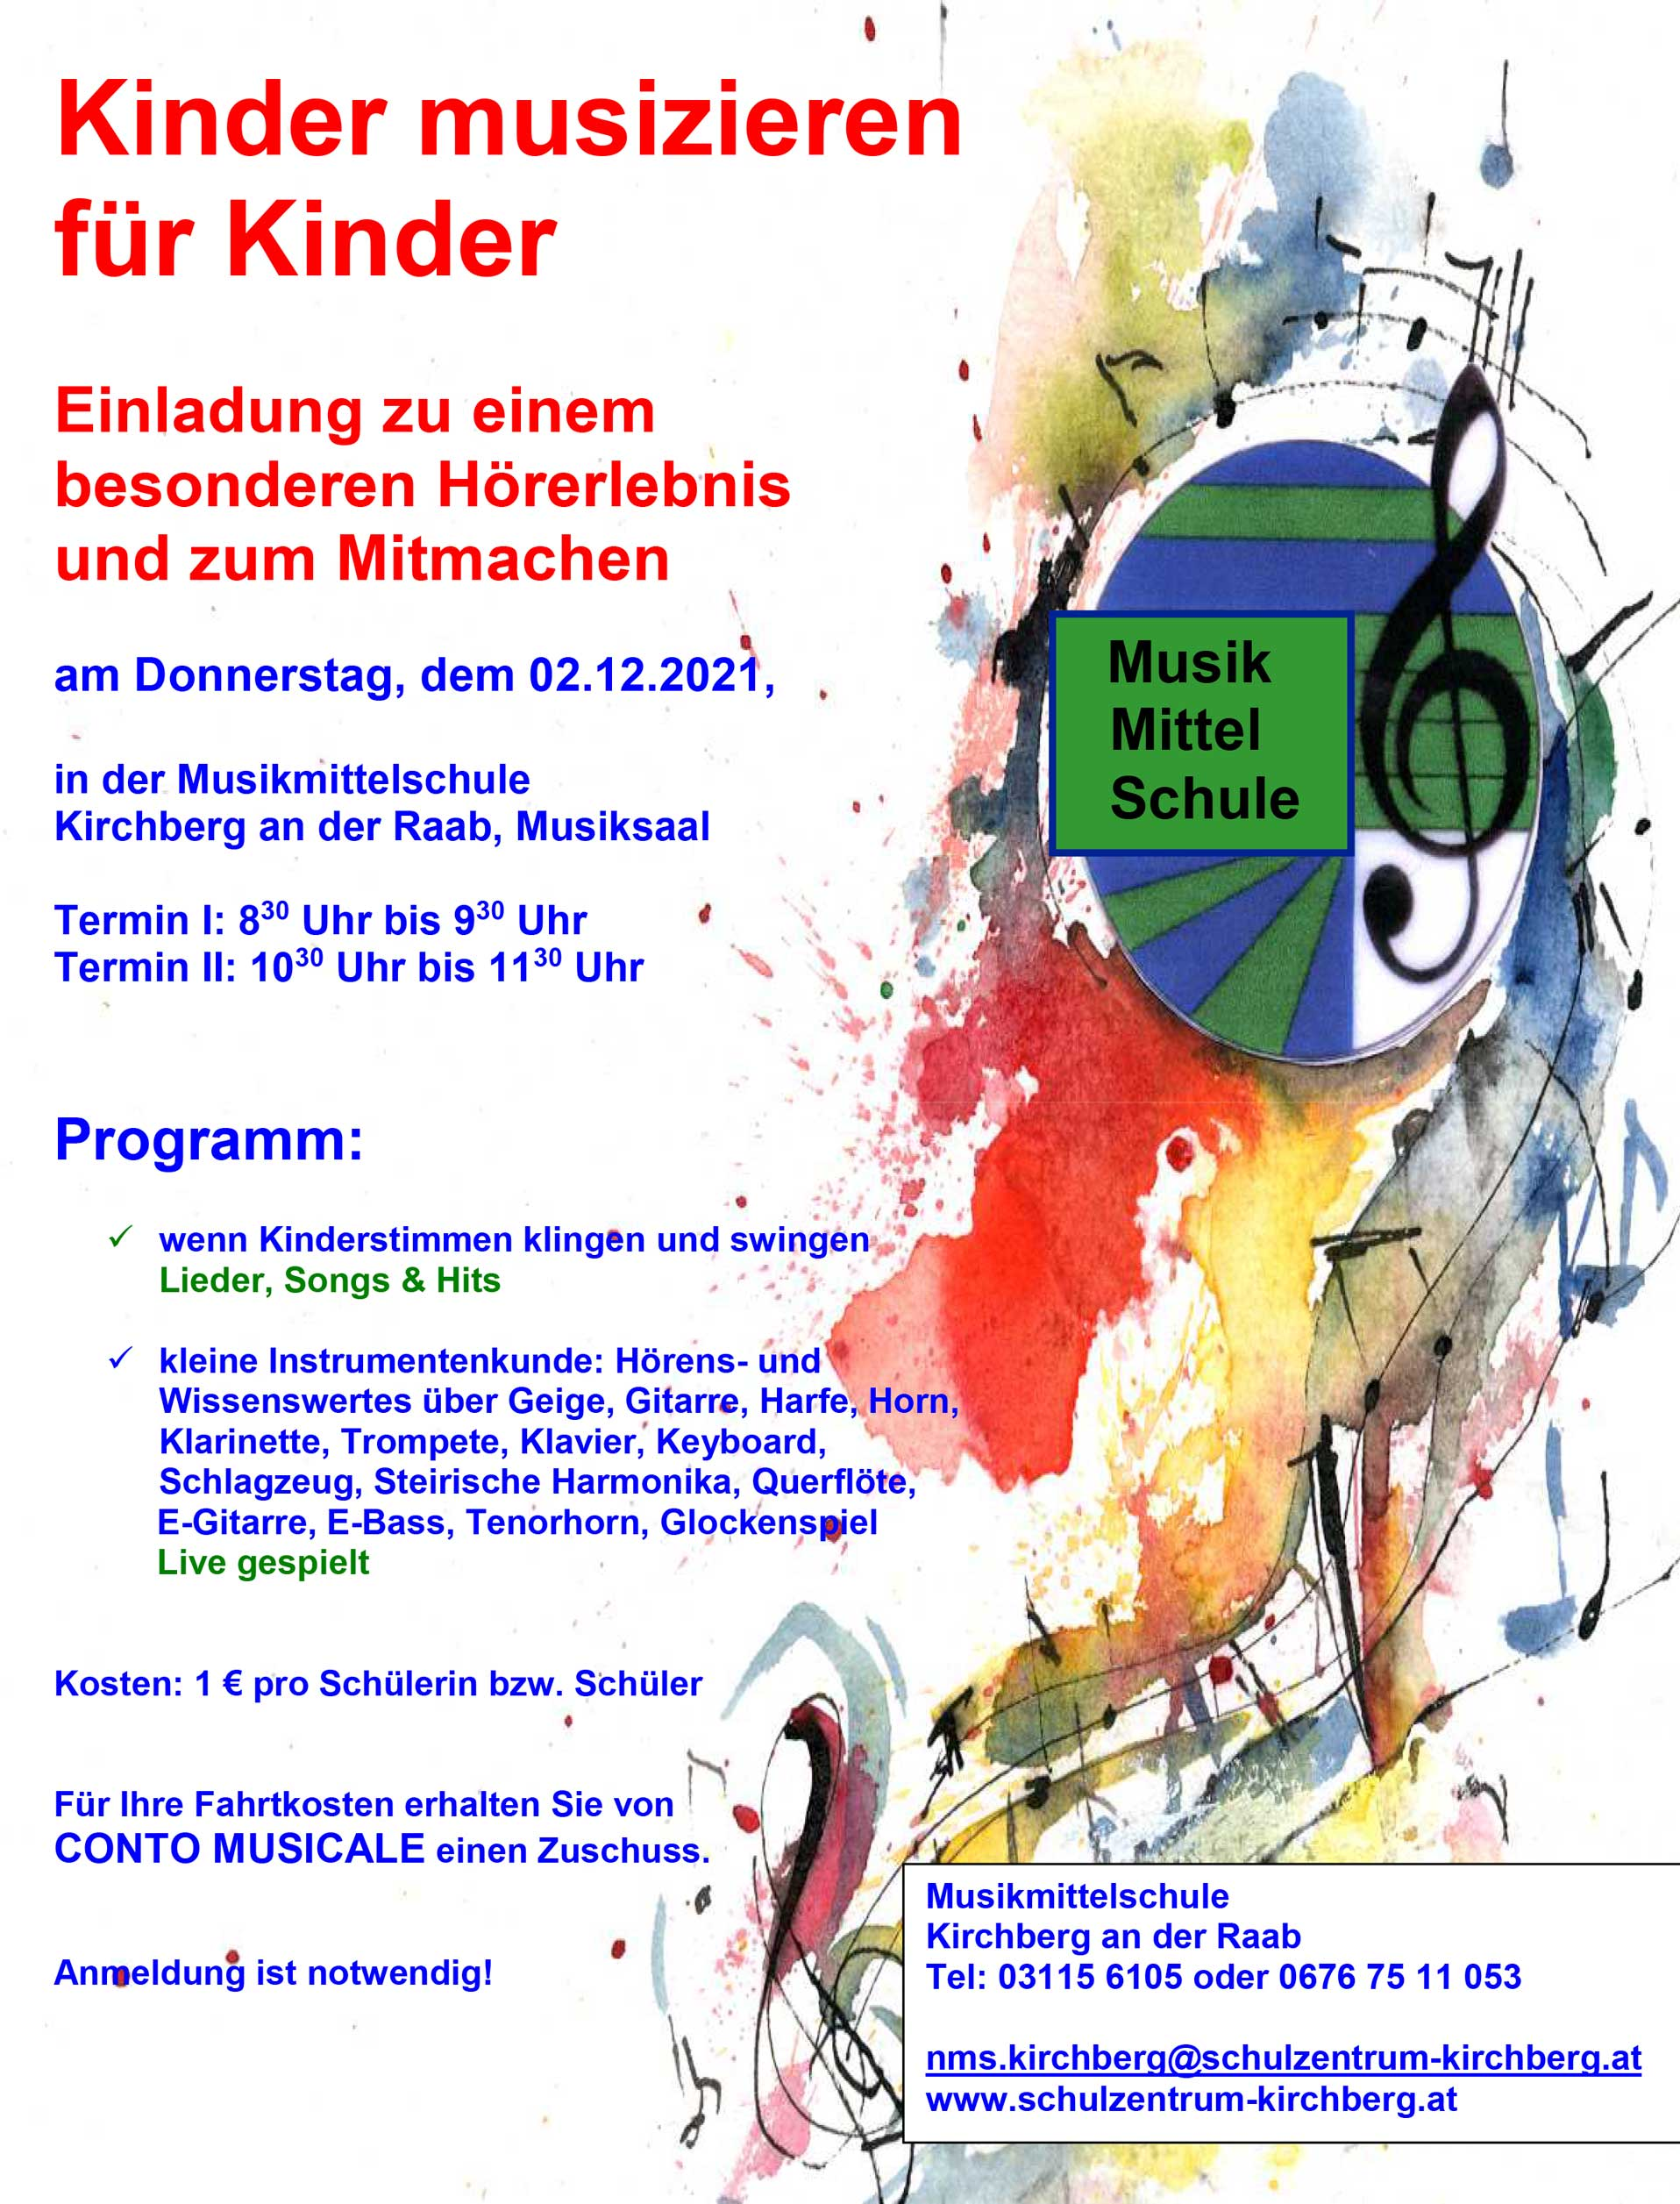 Einladung-Conto-musicale-2021